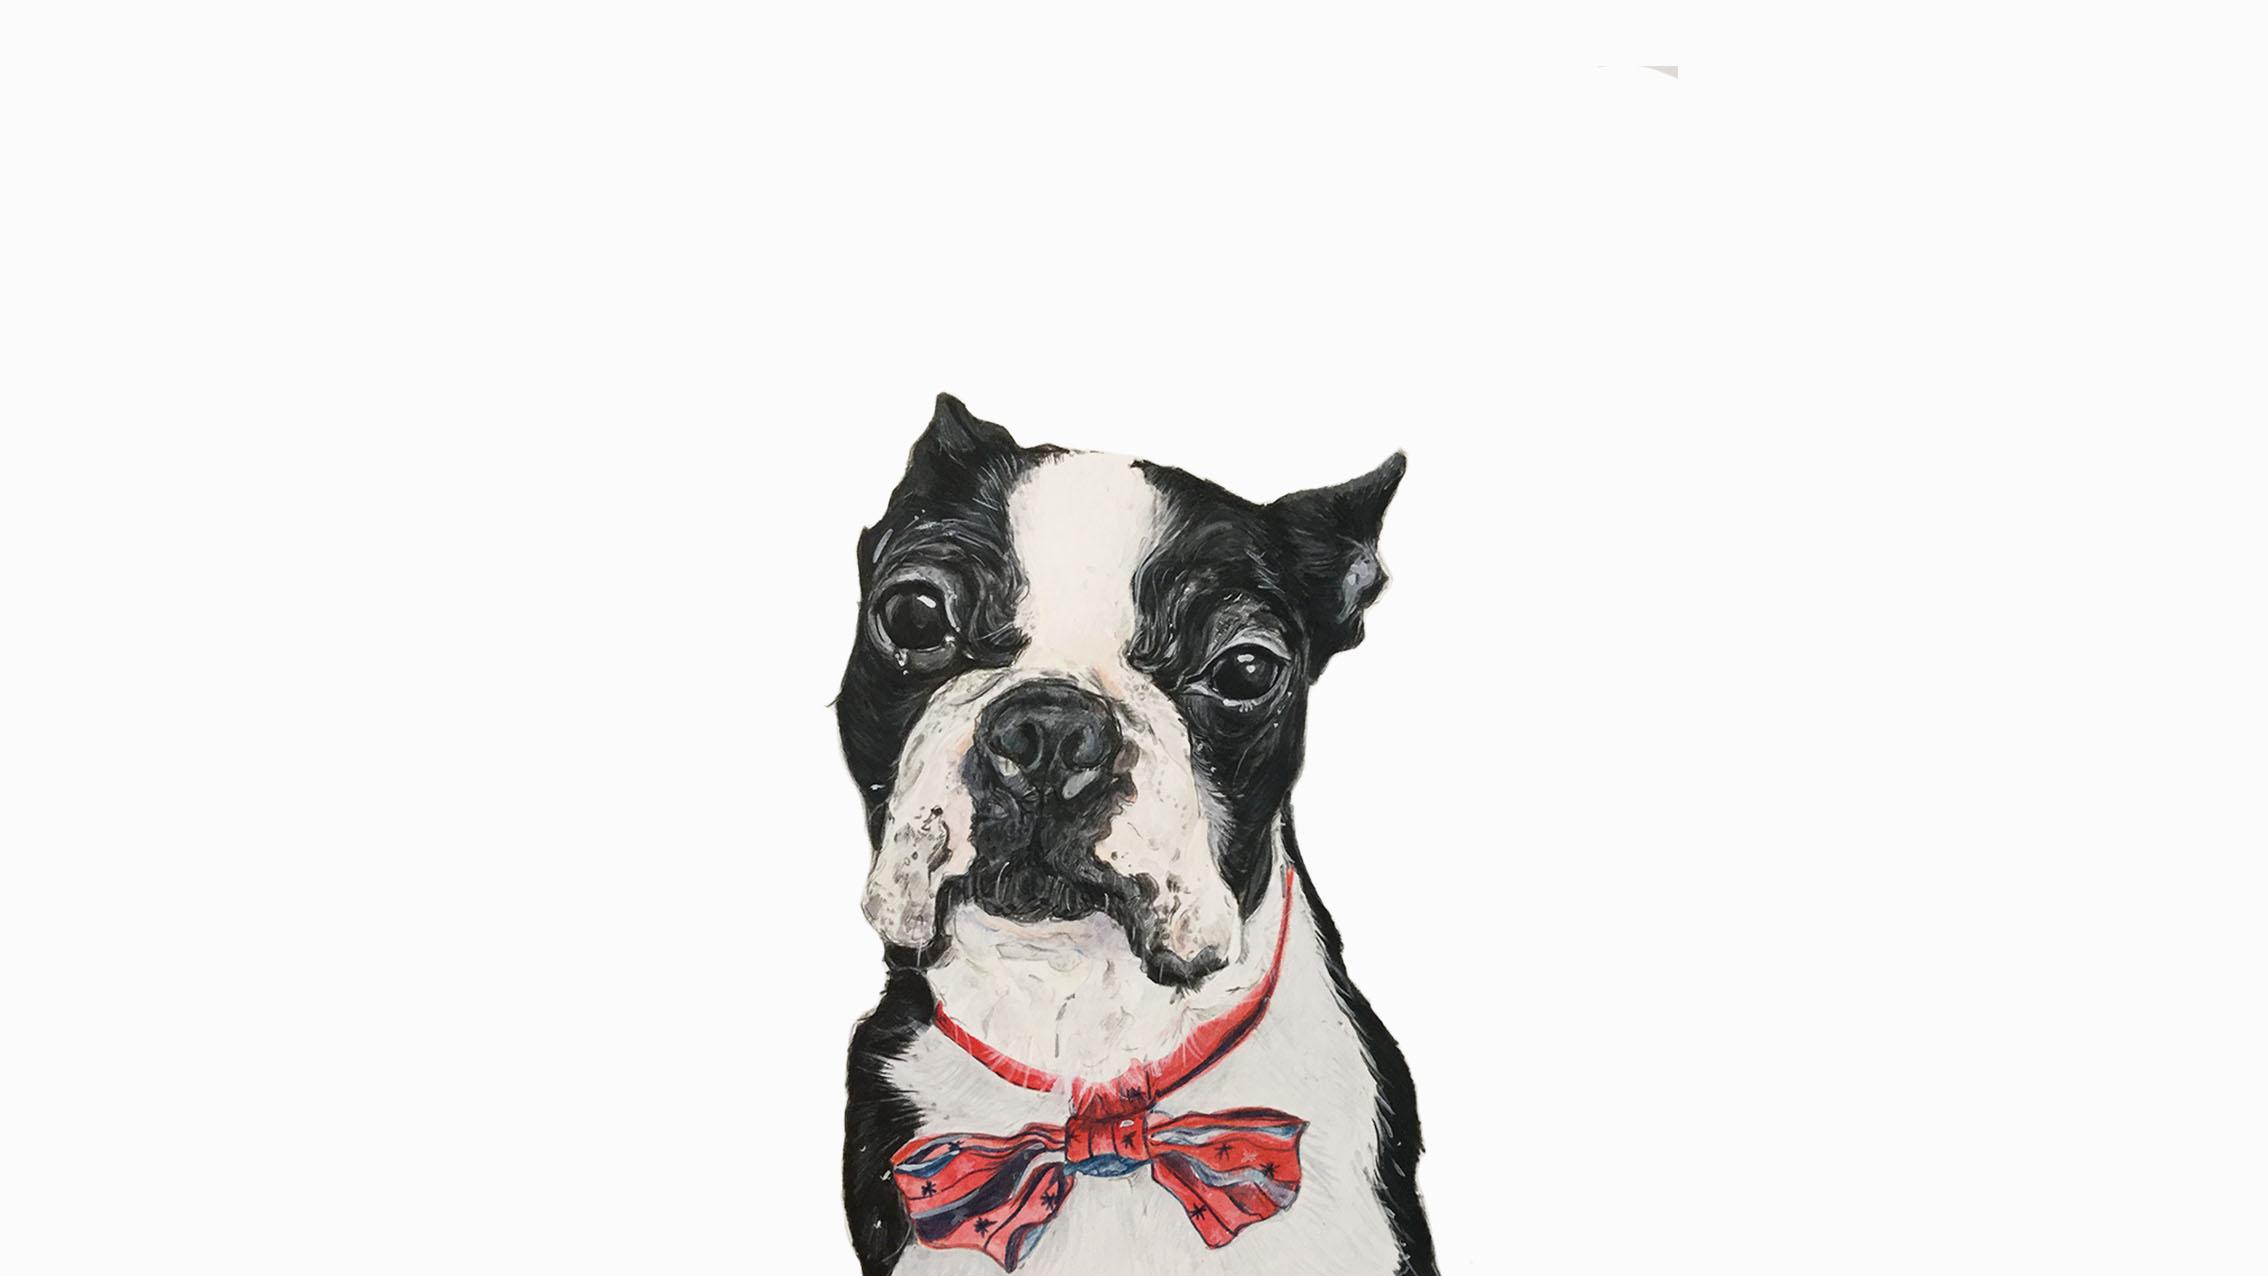 Arni the Boston Terrier